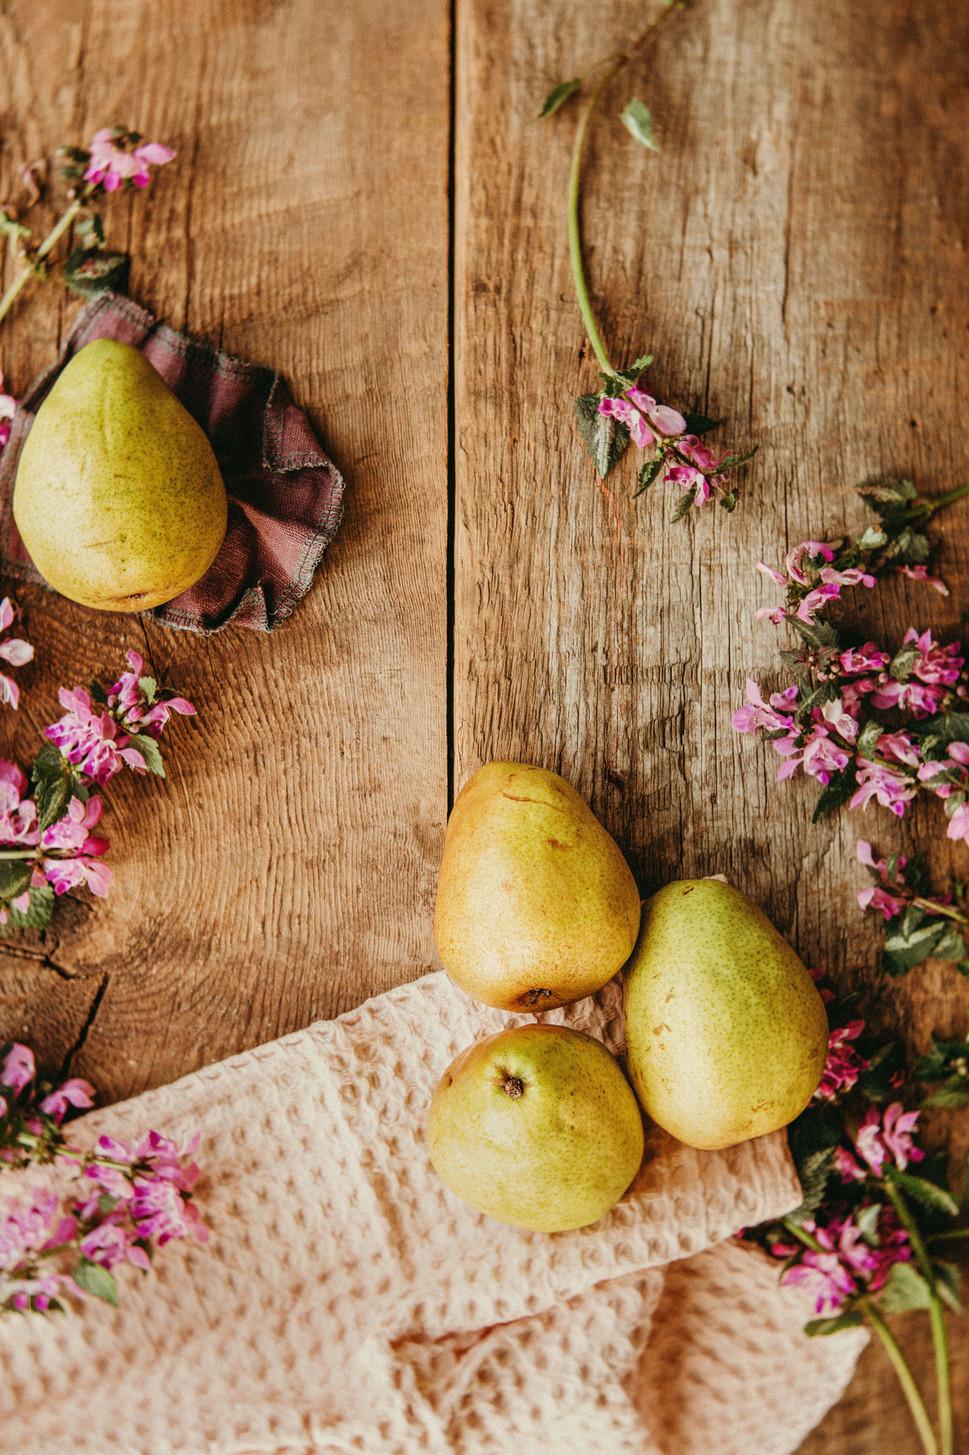 Hollie_Jeakins_Food_Photograhy_Pears.jpg